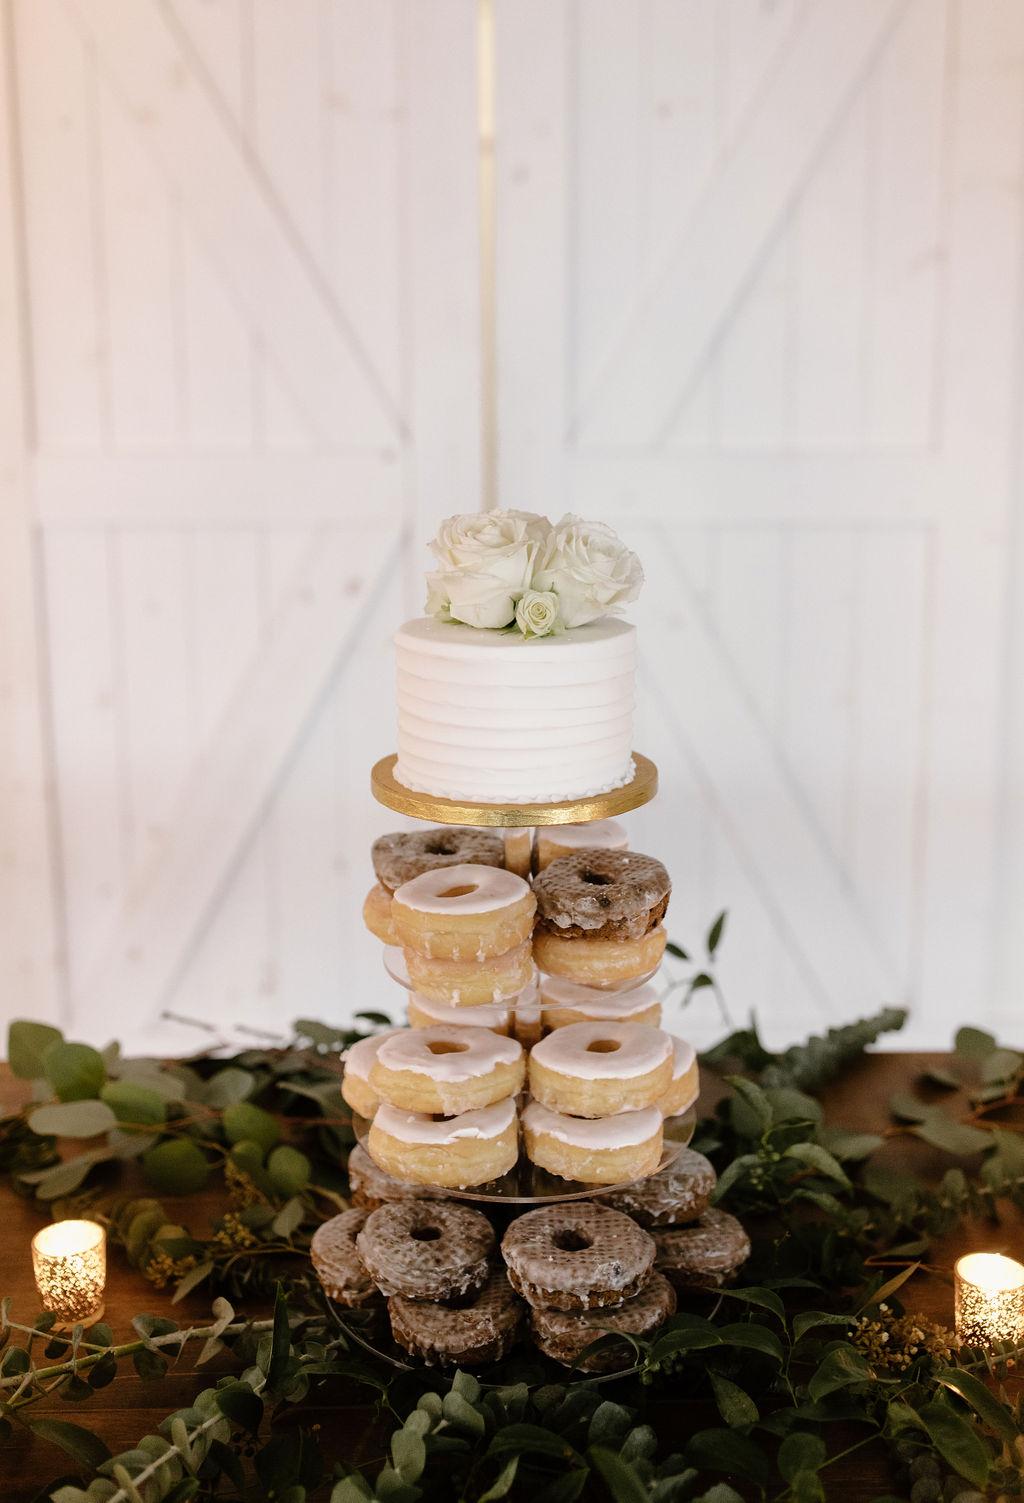 Small wedding cake donut display | Nashville Bride Guide